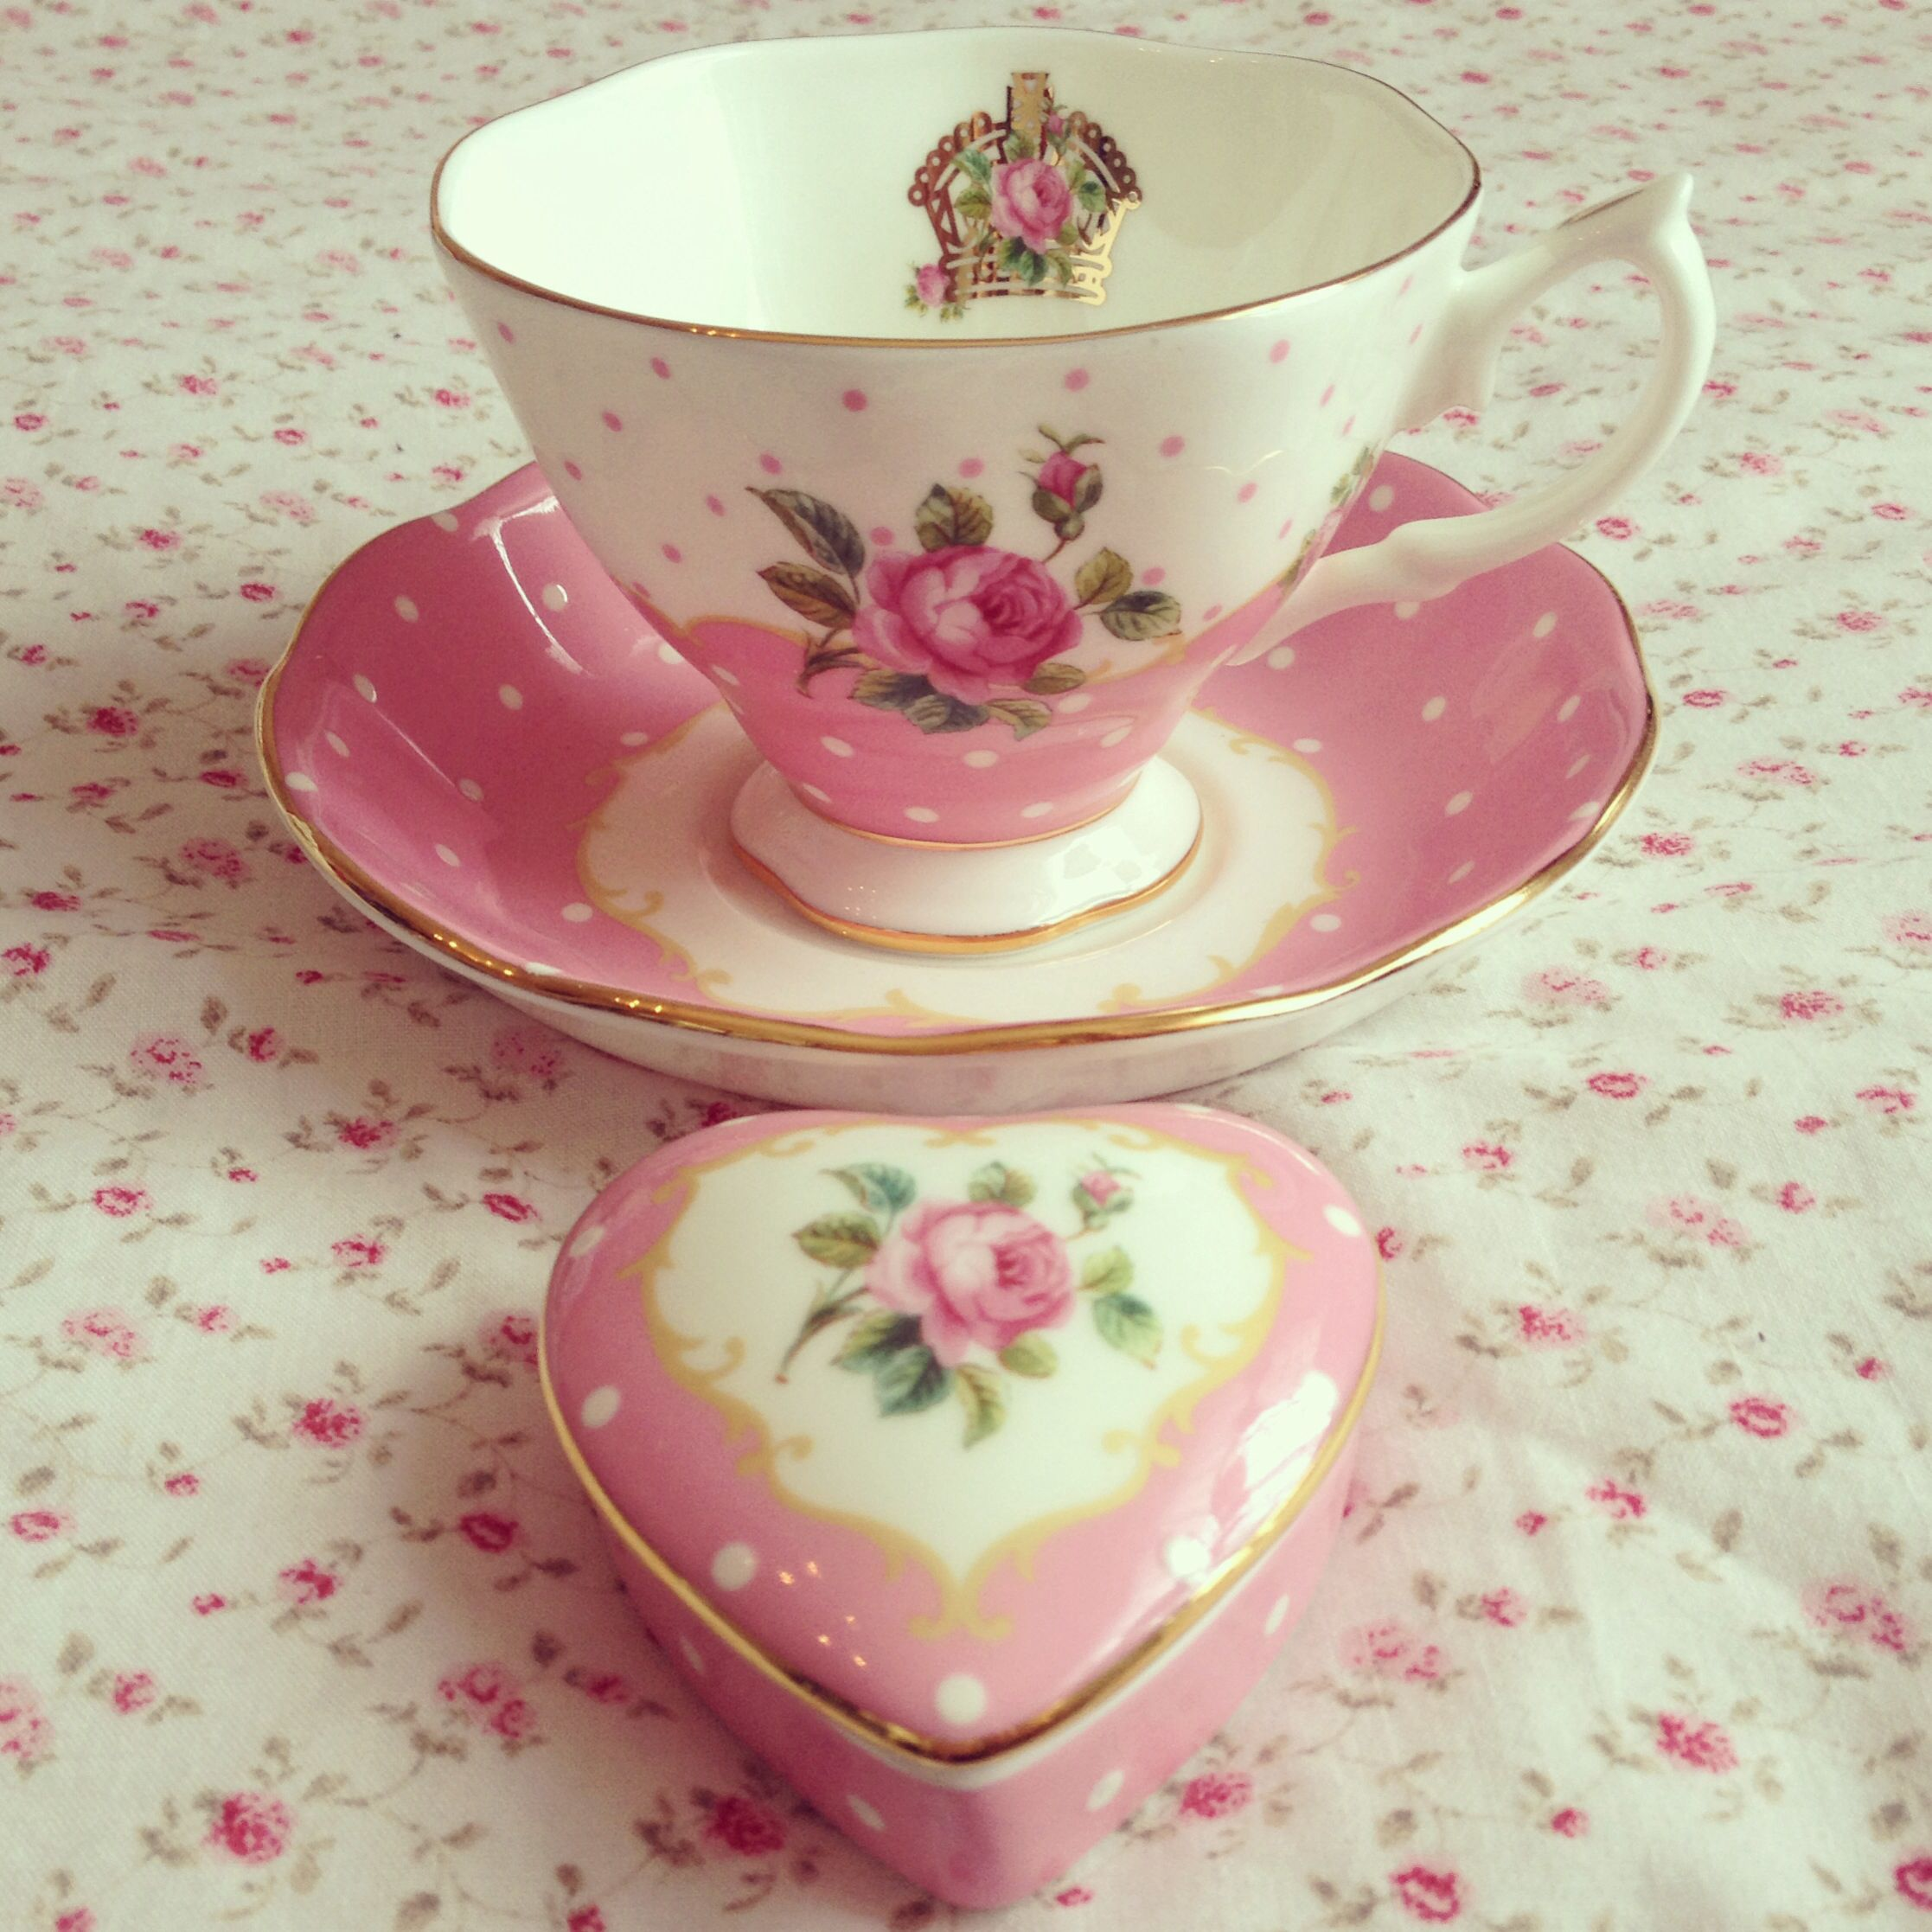 Royal Albert cheeky pink teacup saucer and trinket box.